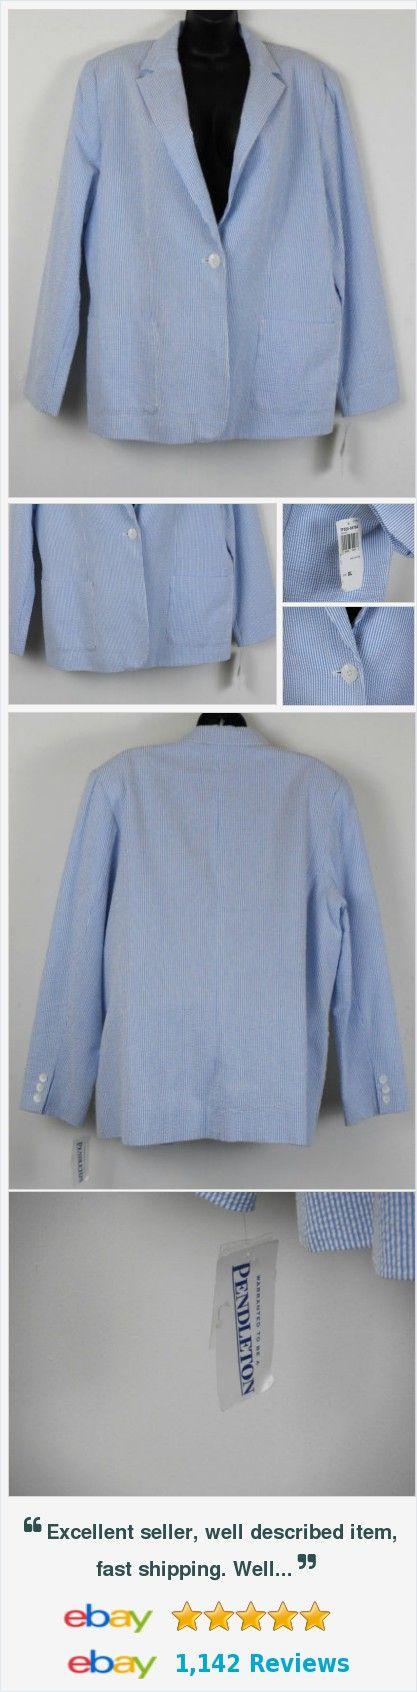 Pendleton Seersucker Blazer Womens Size XL Blue White New With Tags 100% Cotton http://www.ebay.com/itm/Pendleton-Seersucker-Blazer-Womens-Size-XL-Blue-White-New-With-Tags-100-Cotton-/272237023444?ssPageName=STRK:MESE:IT